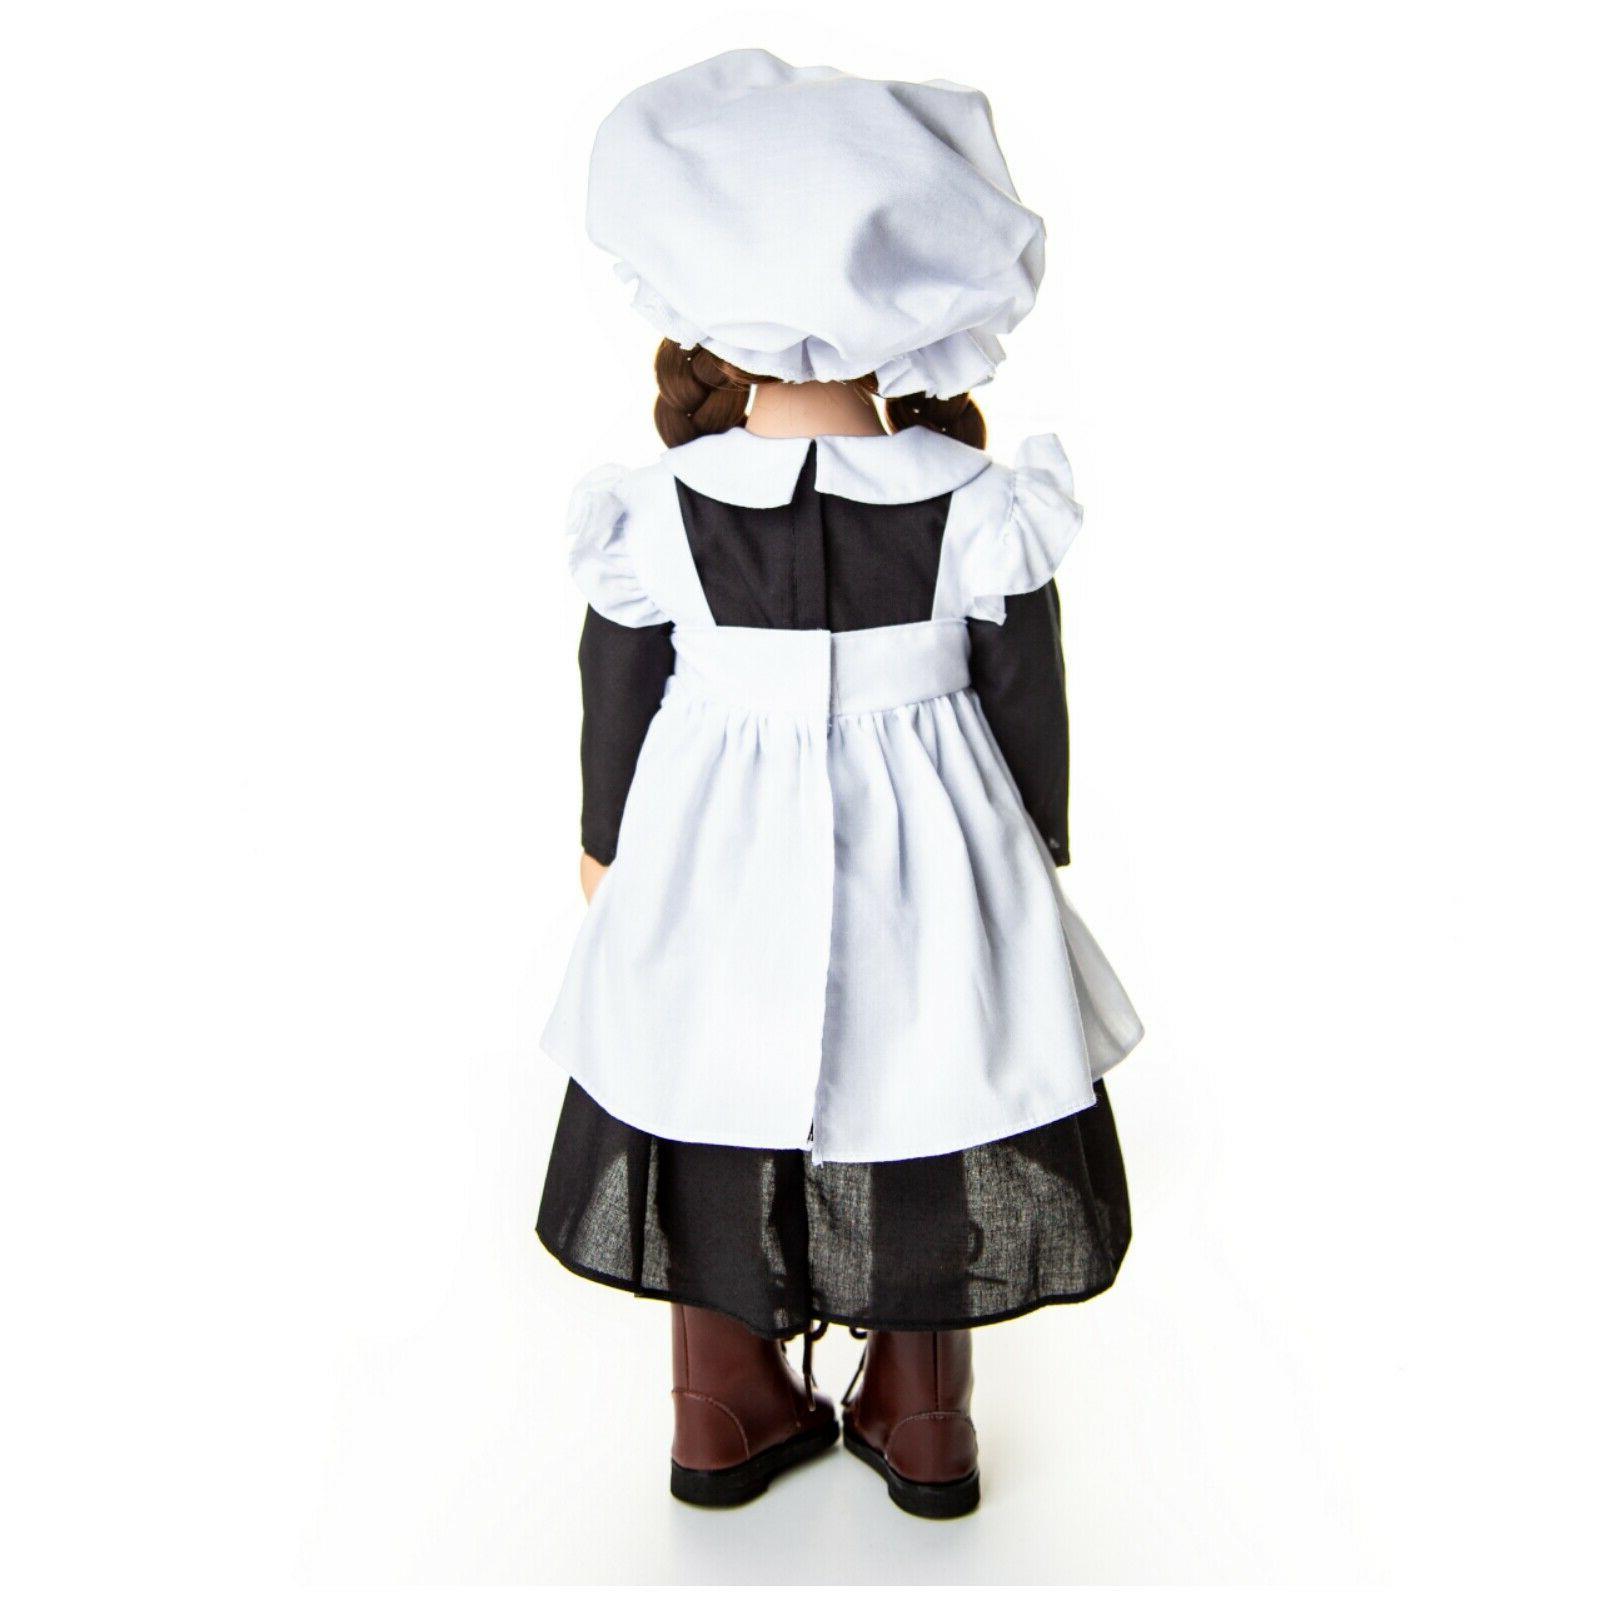 18 Inch Doll 4 MAID Fits American Girl